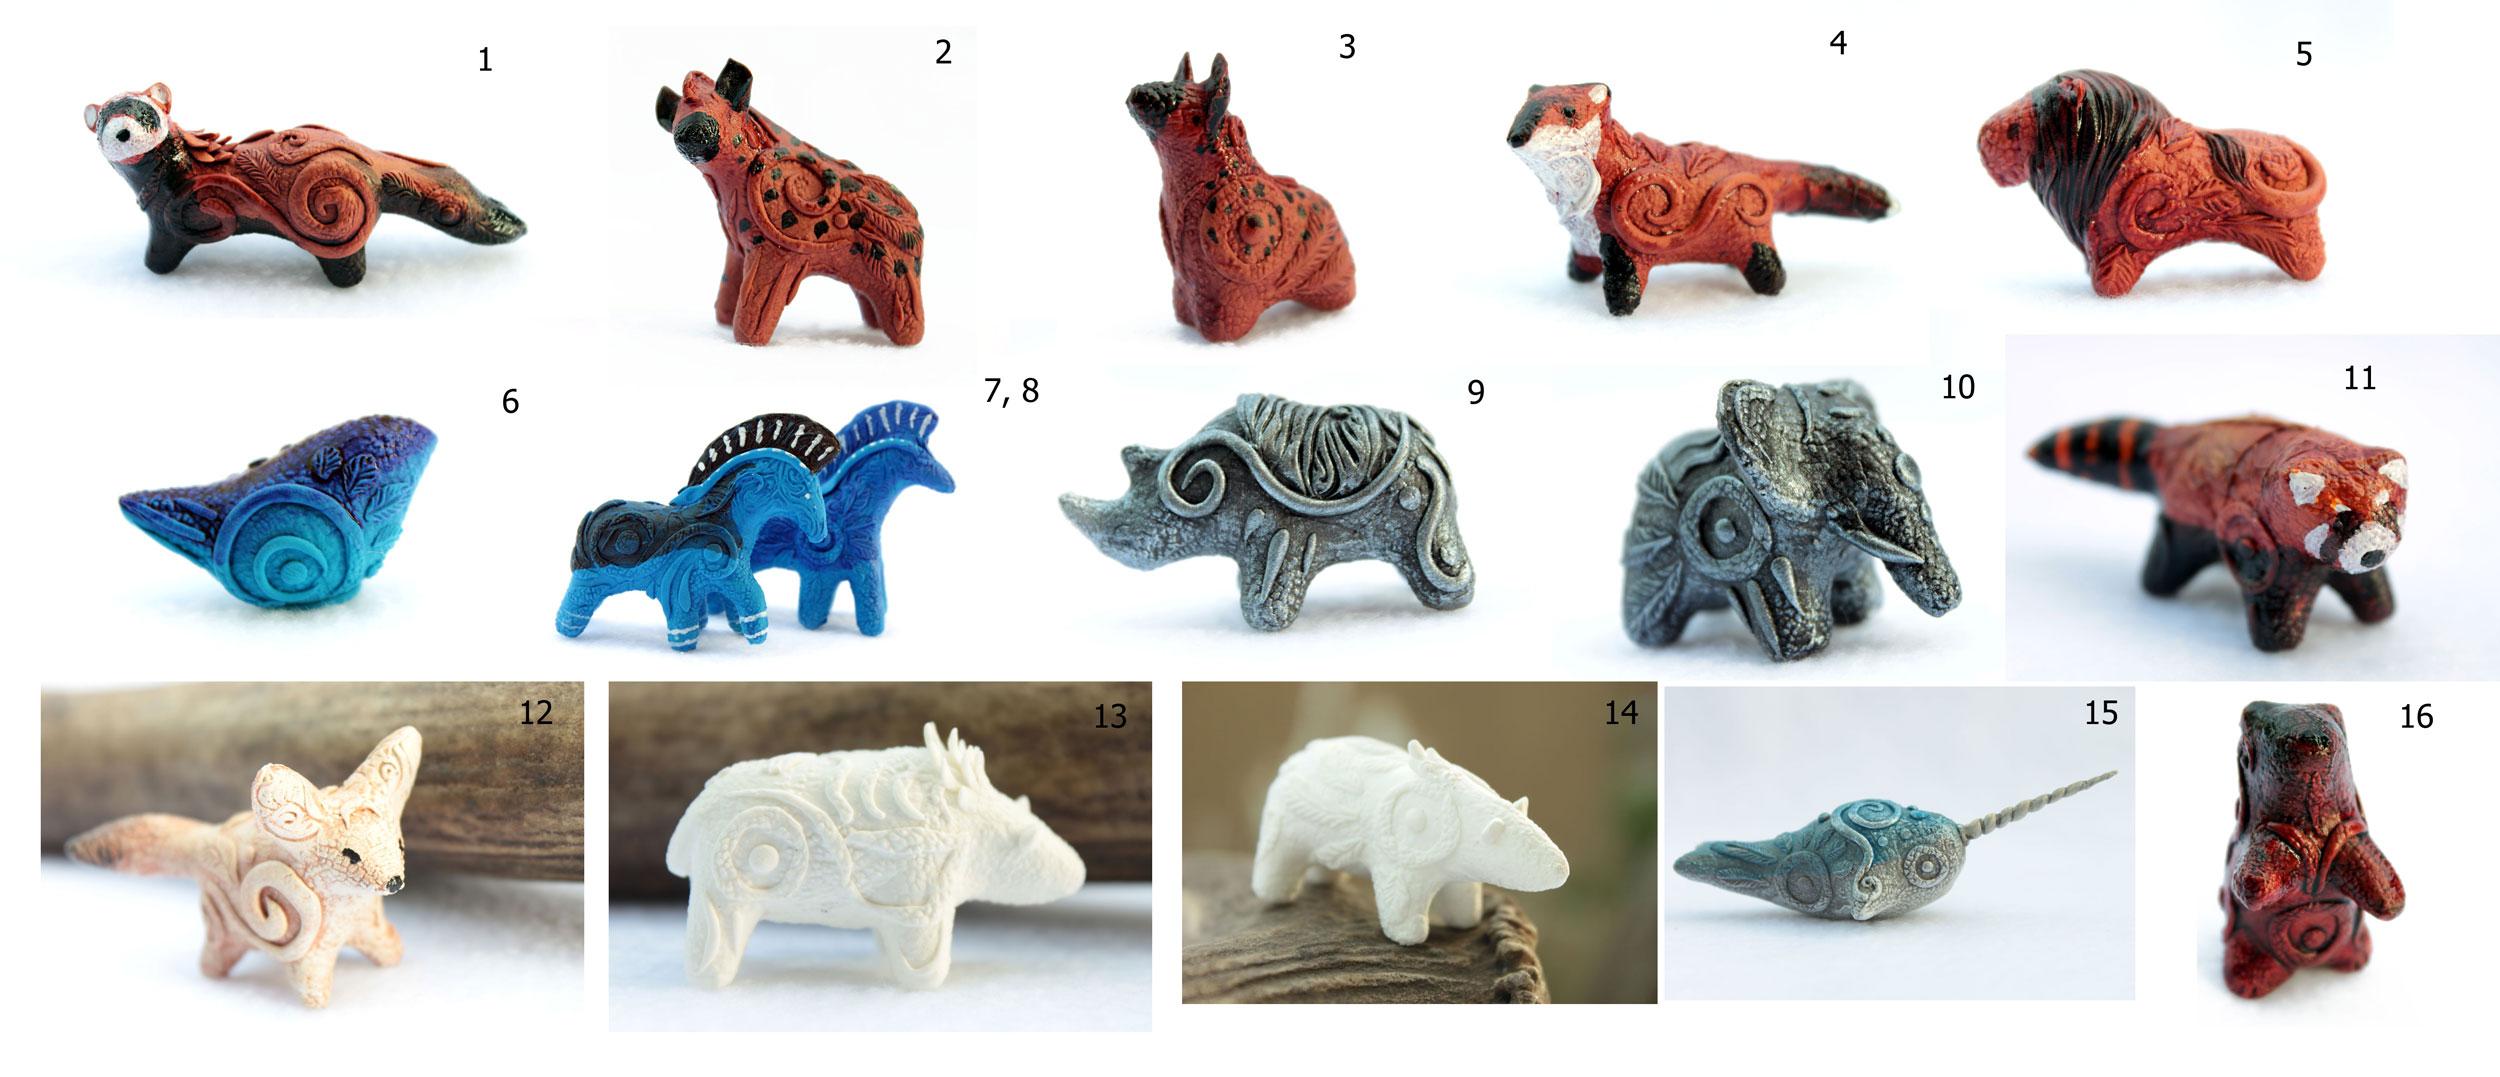 Miniatures-II by hontor